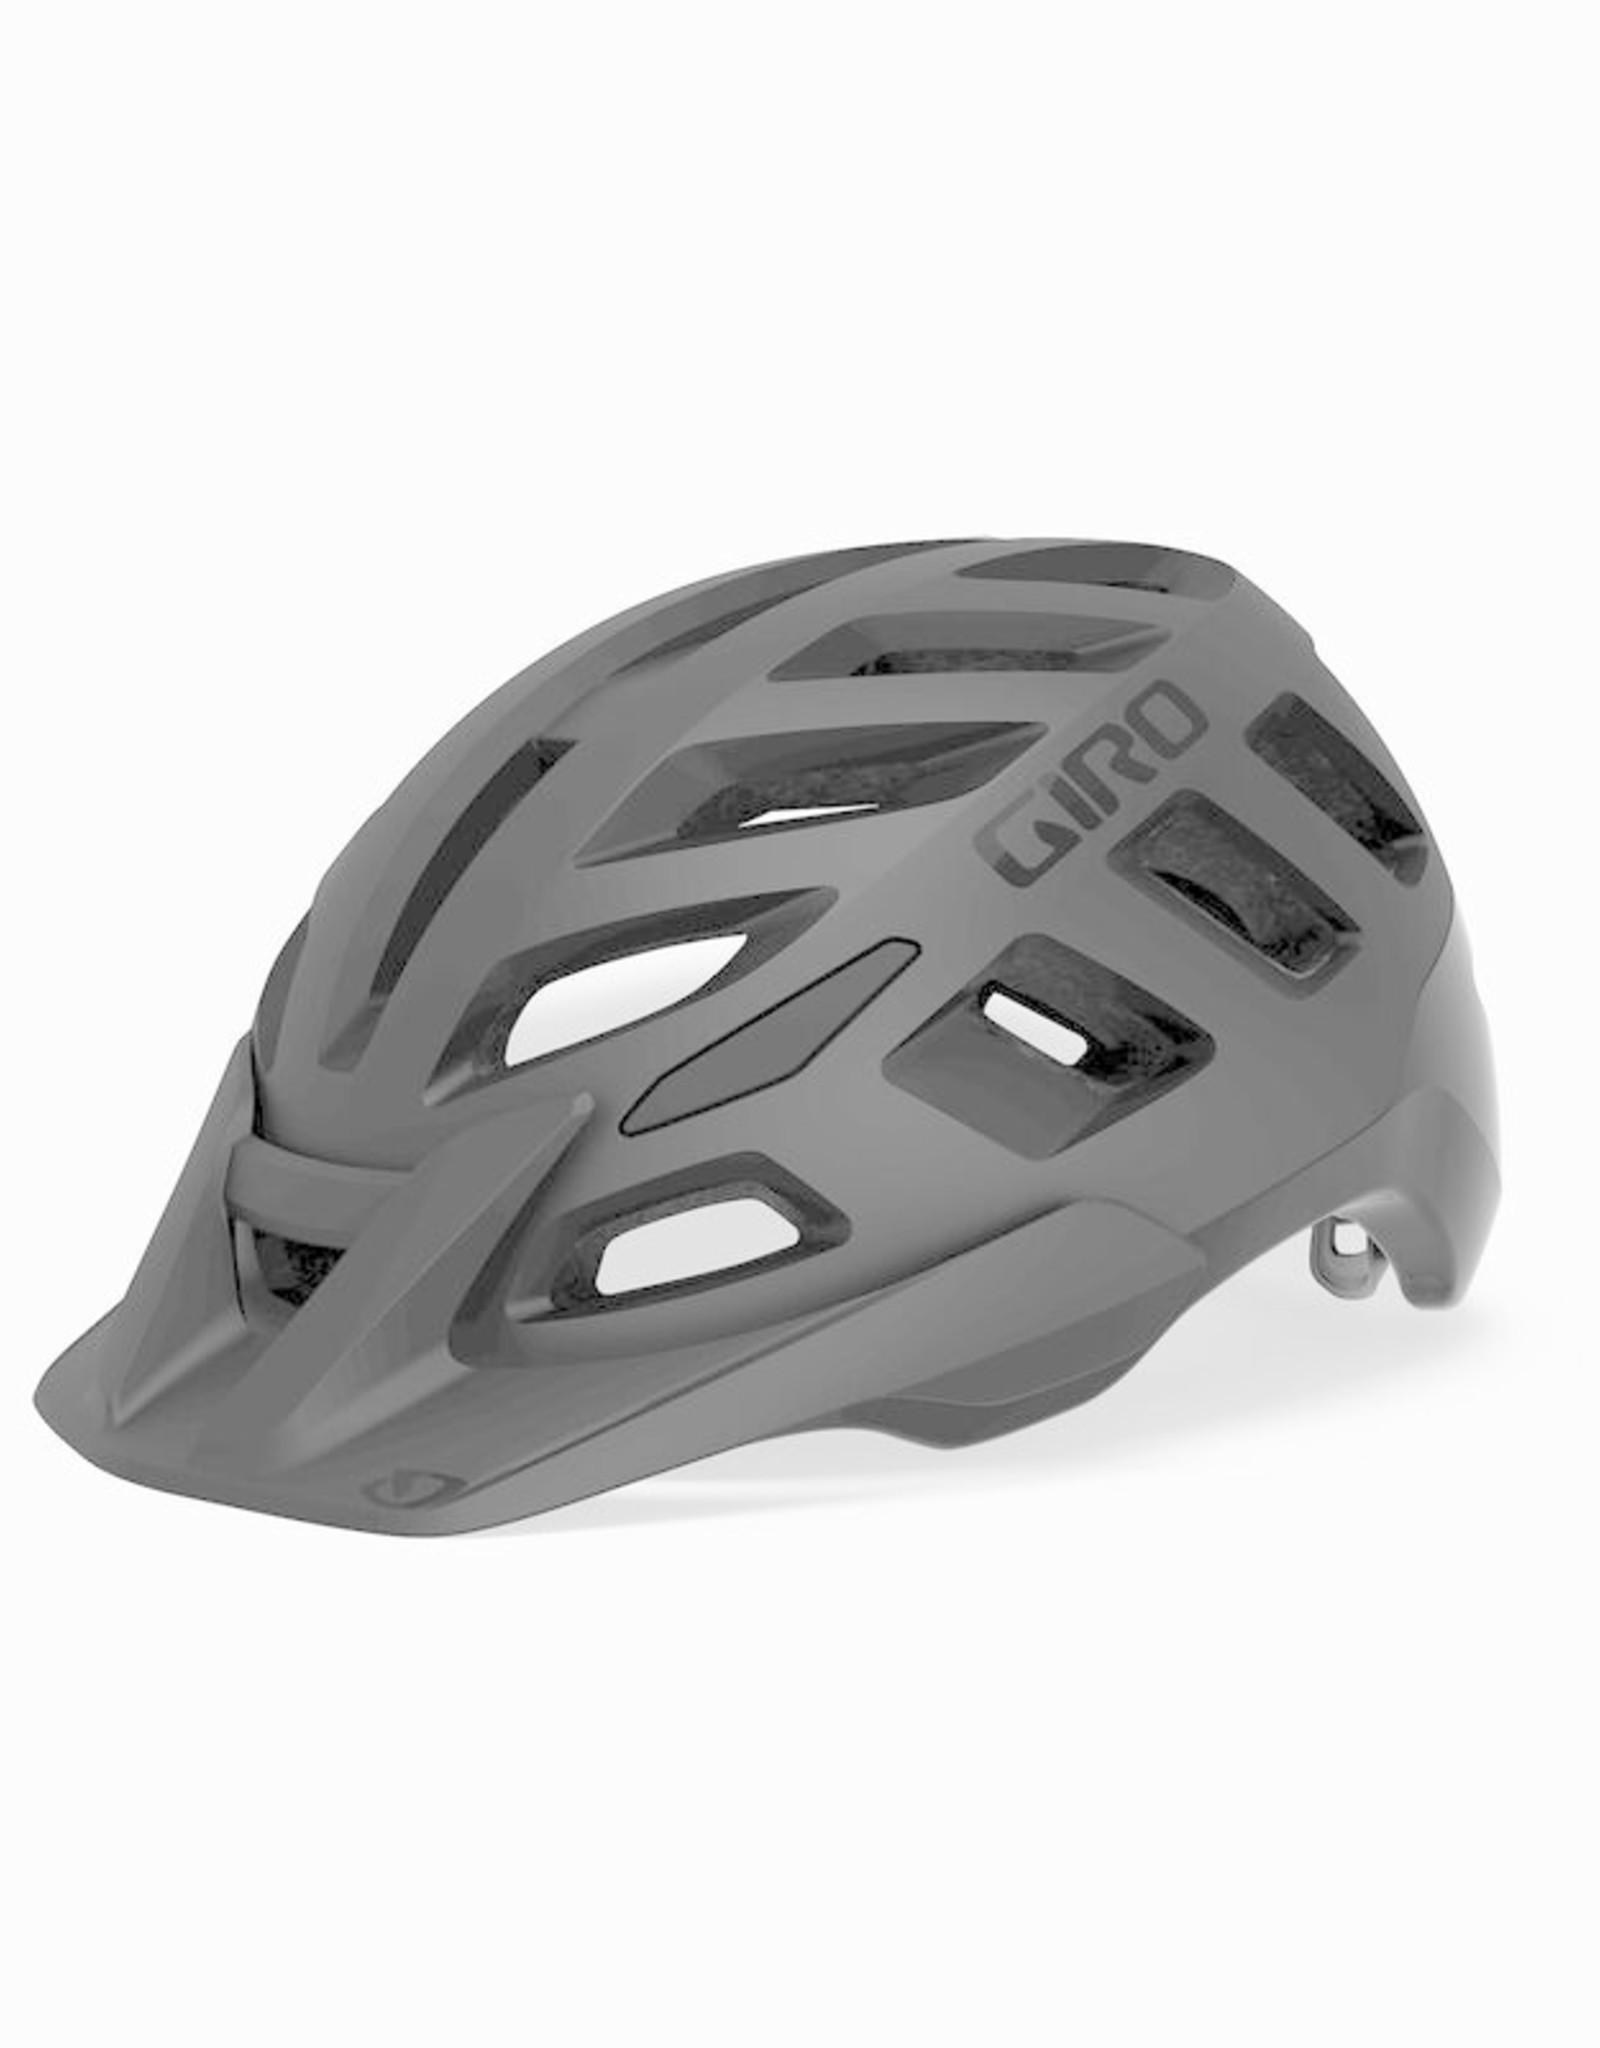 Giro 2020 Radix MIPS Bike Helmet